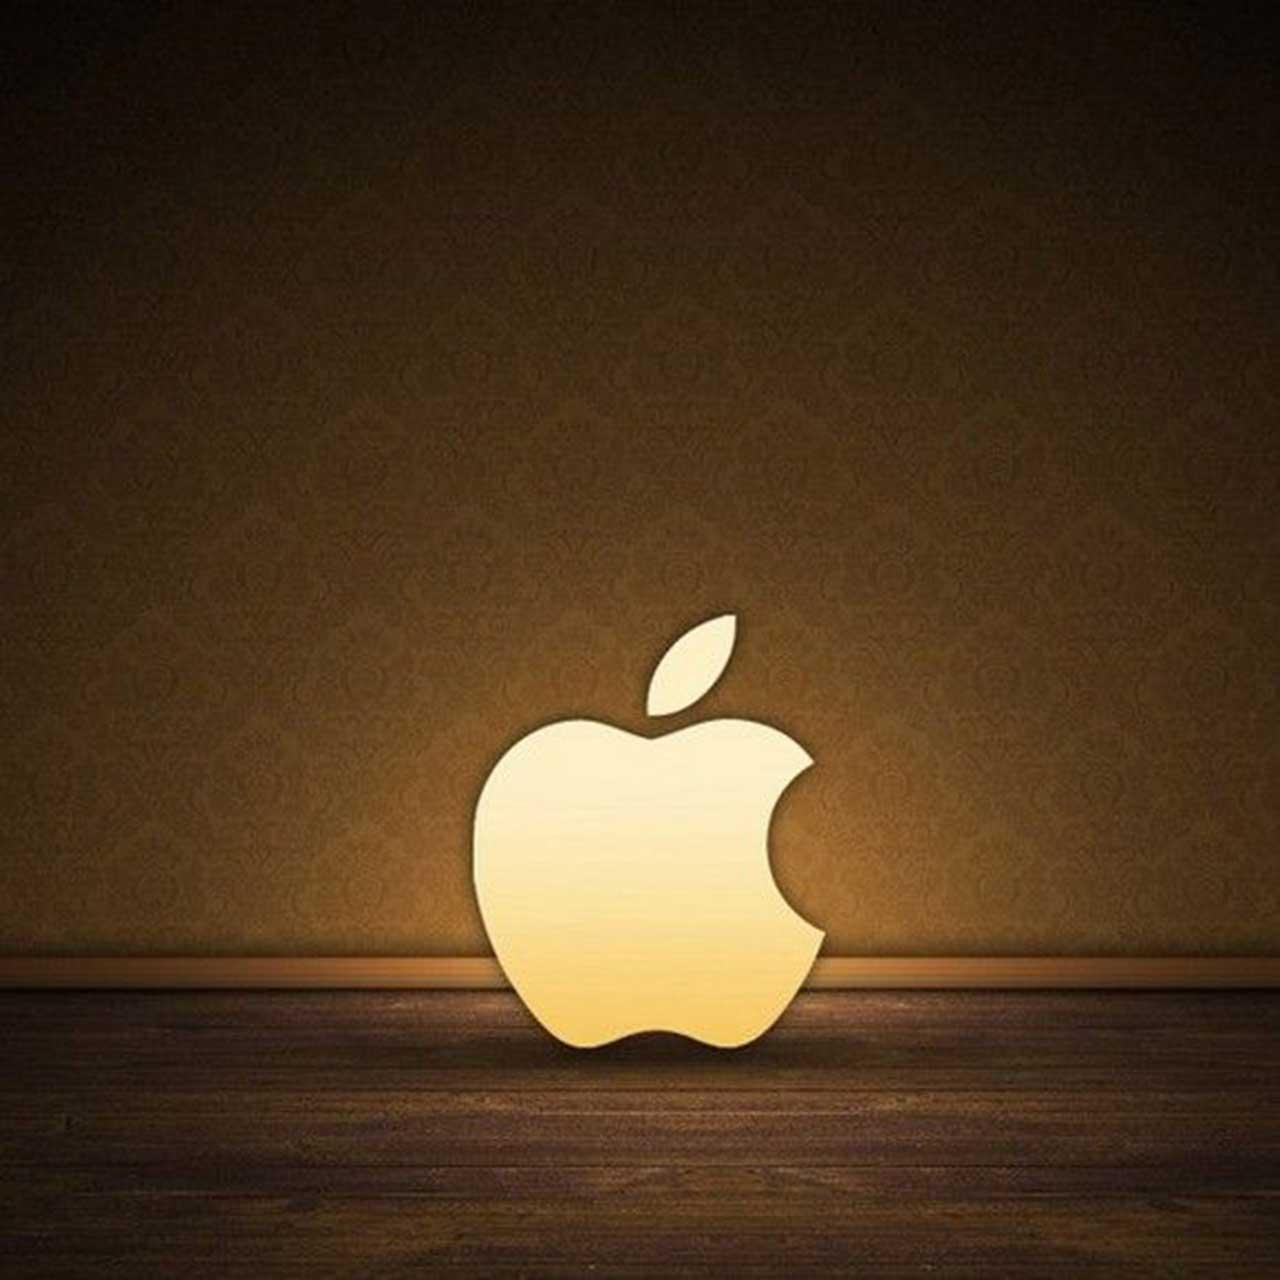 apple logo ipad wallpaper